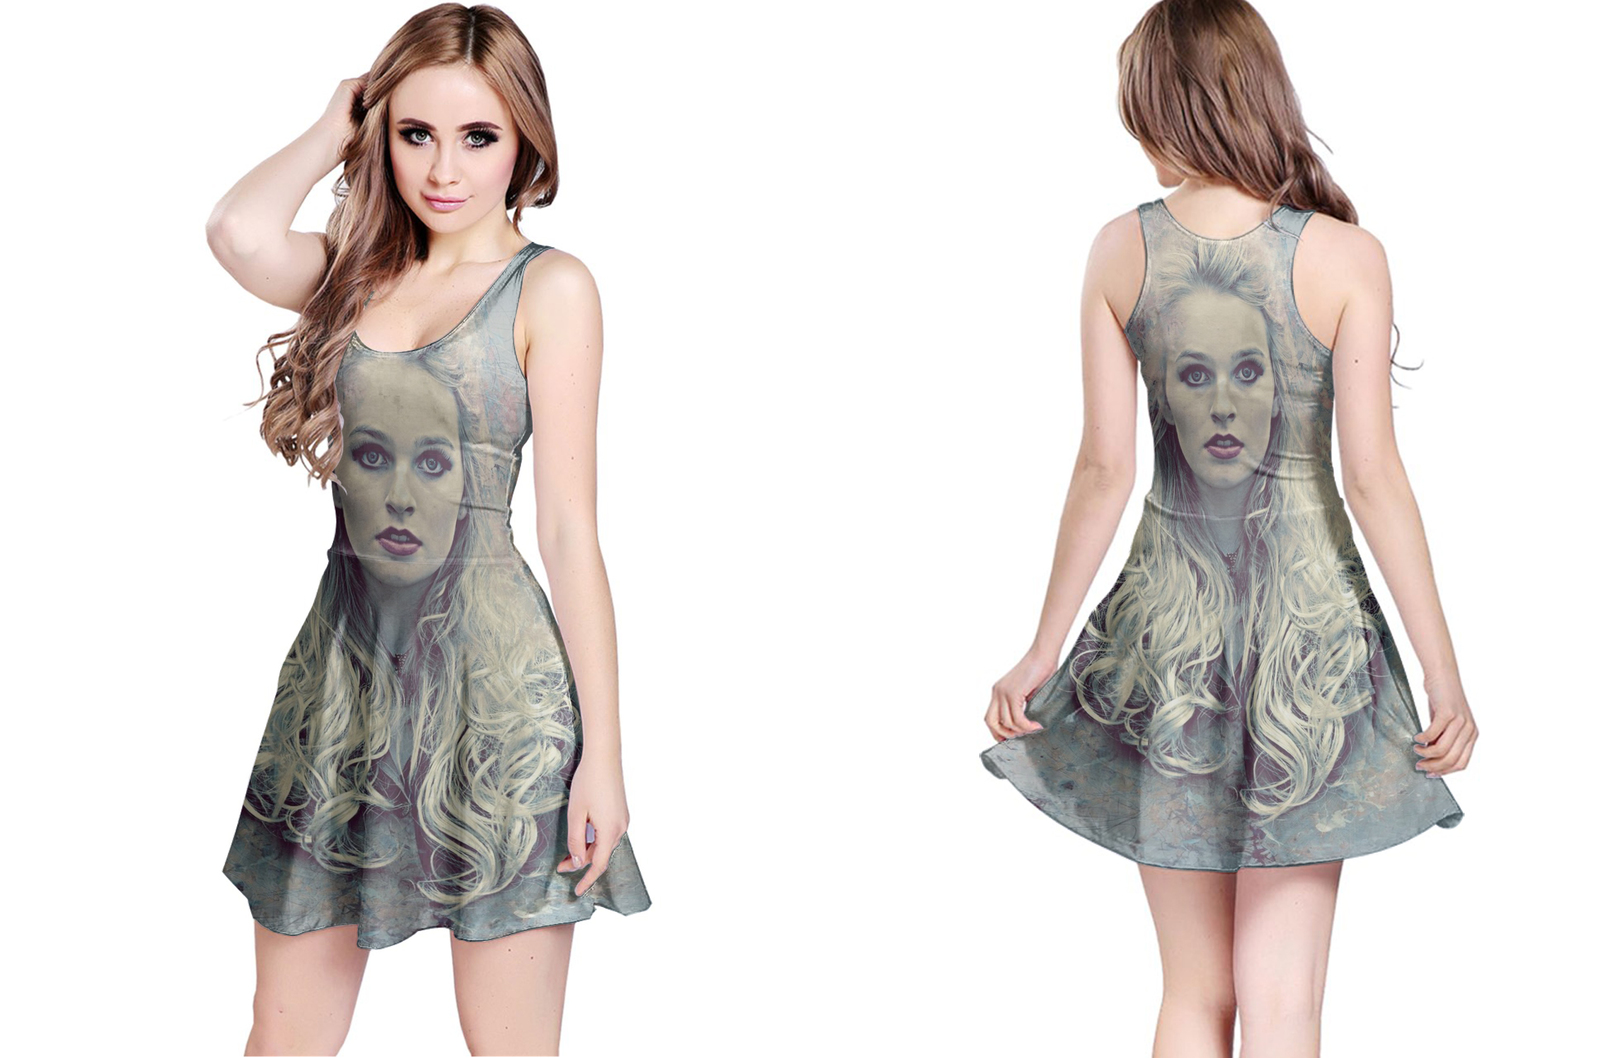 Retro art photoshop action reversible dress